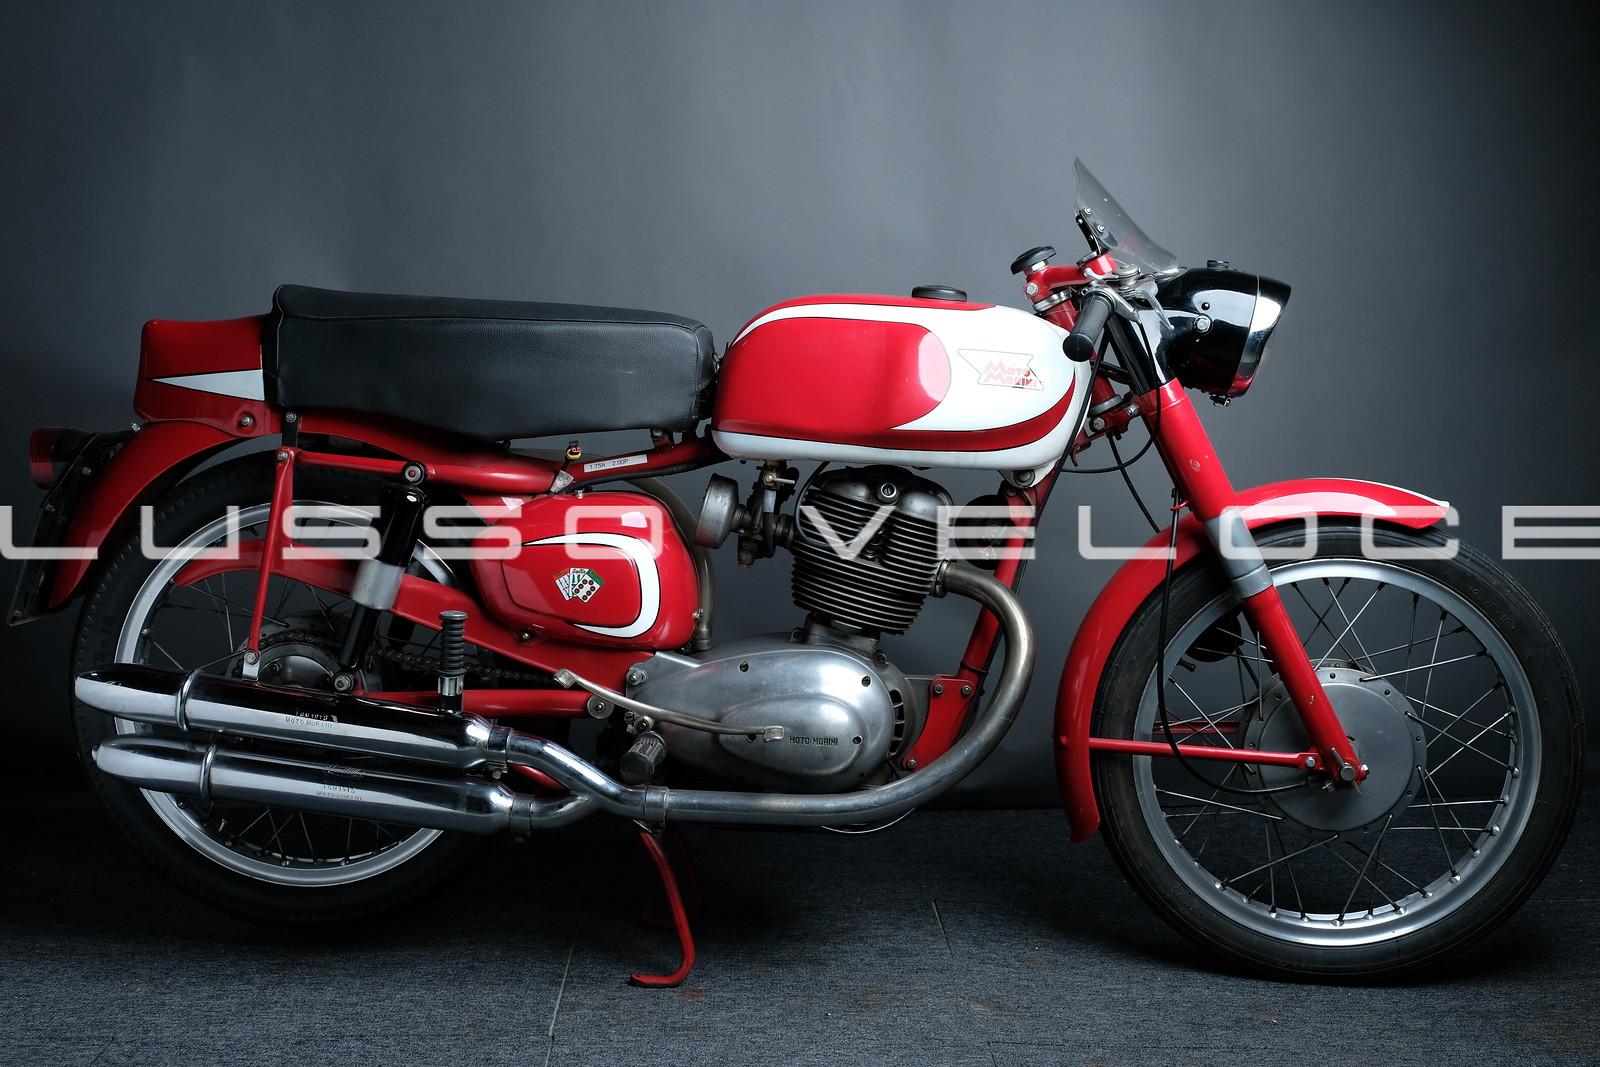 Moto Morini Tresette Sprint 175